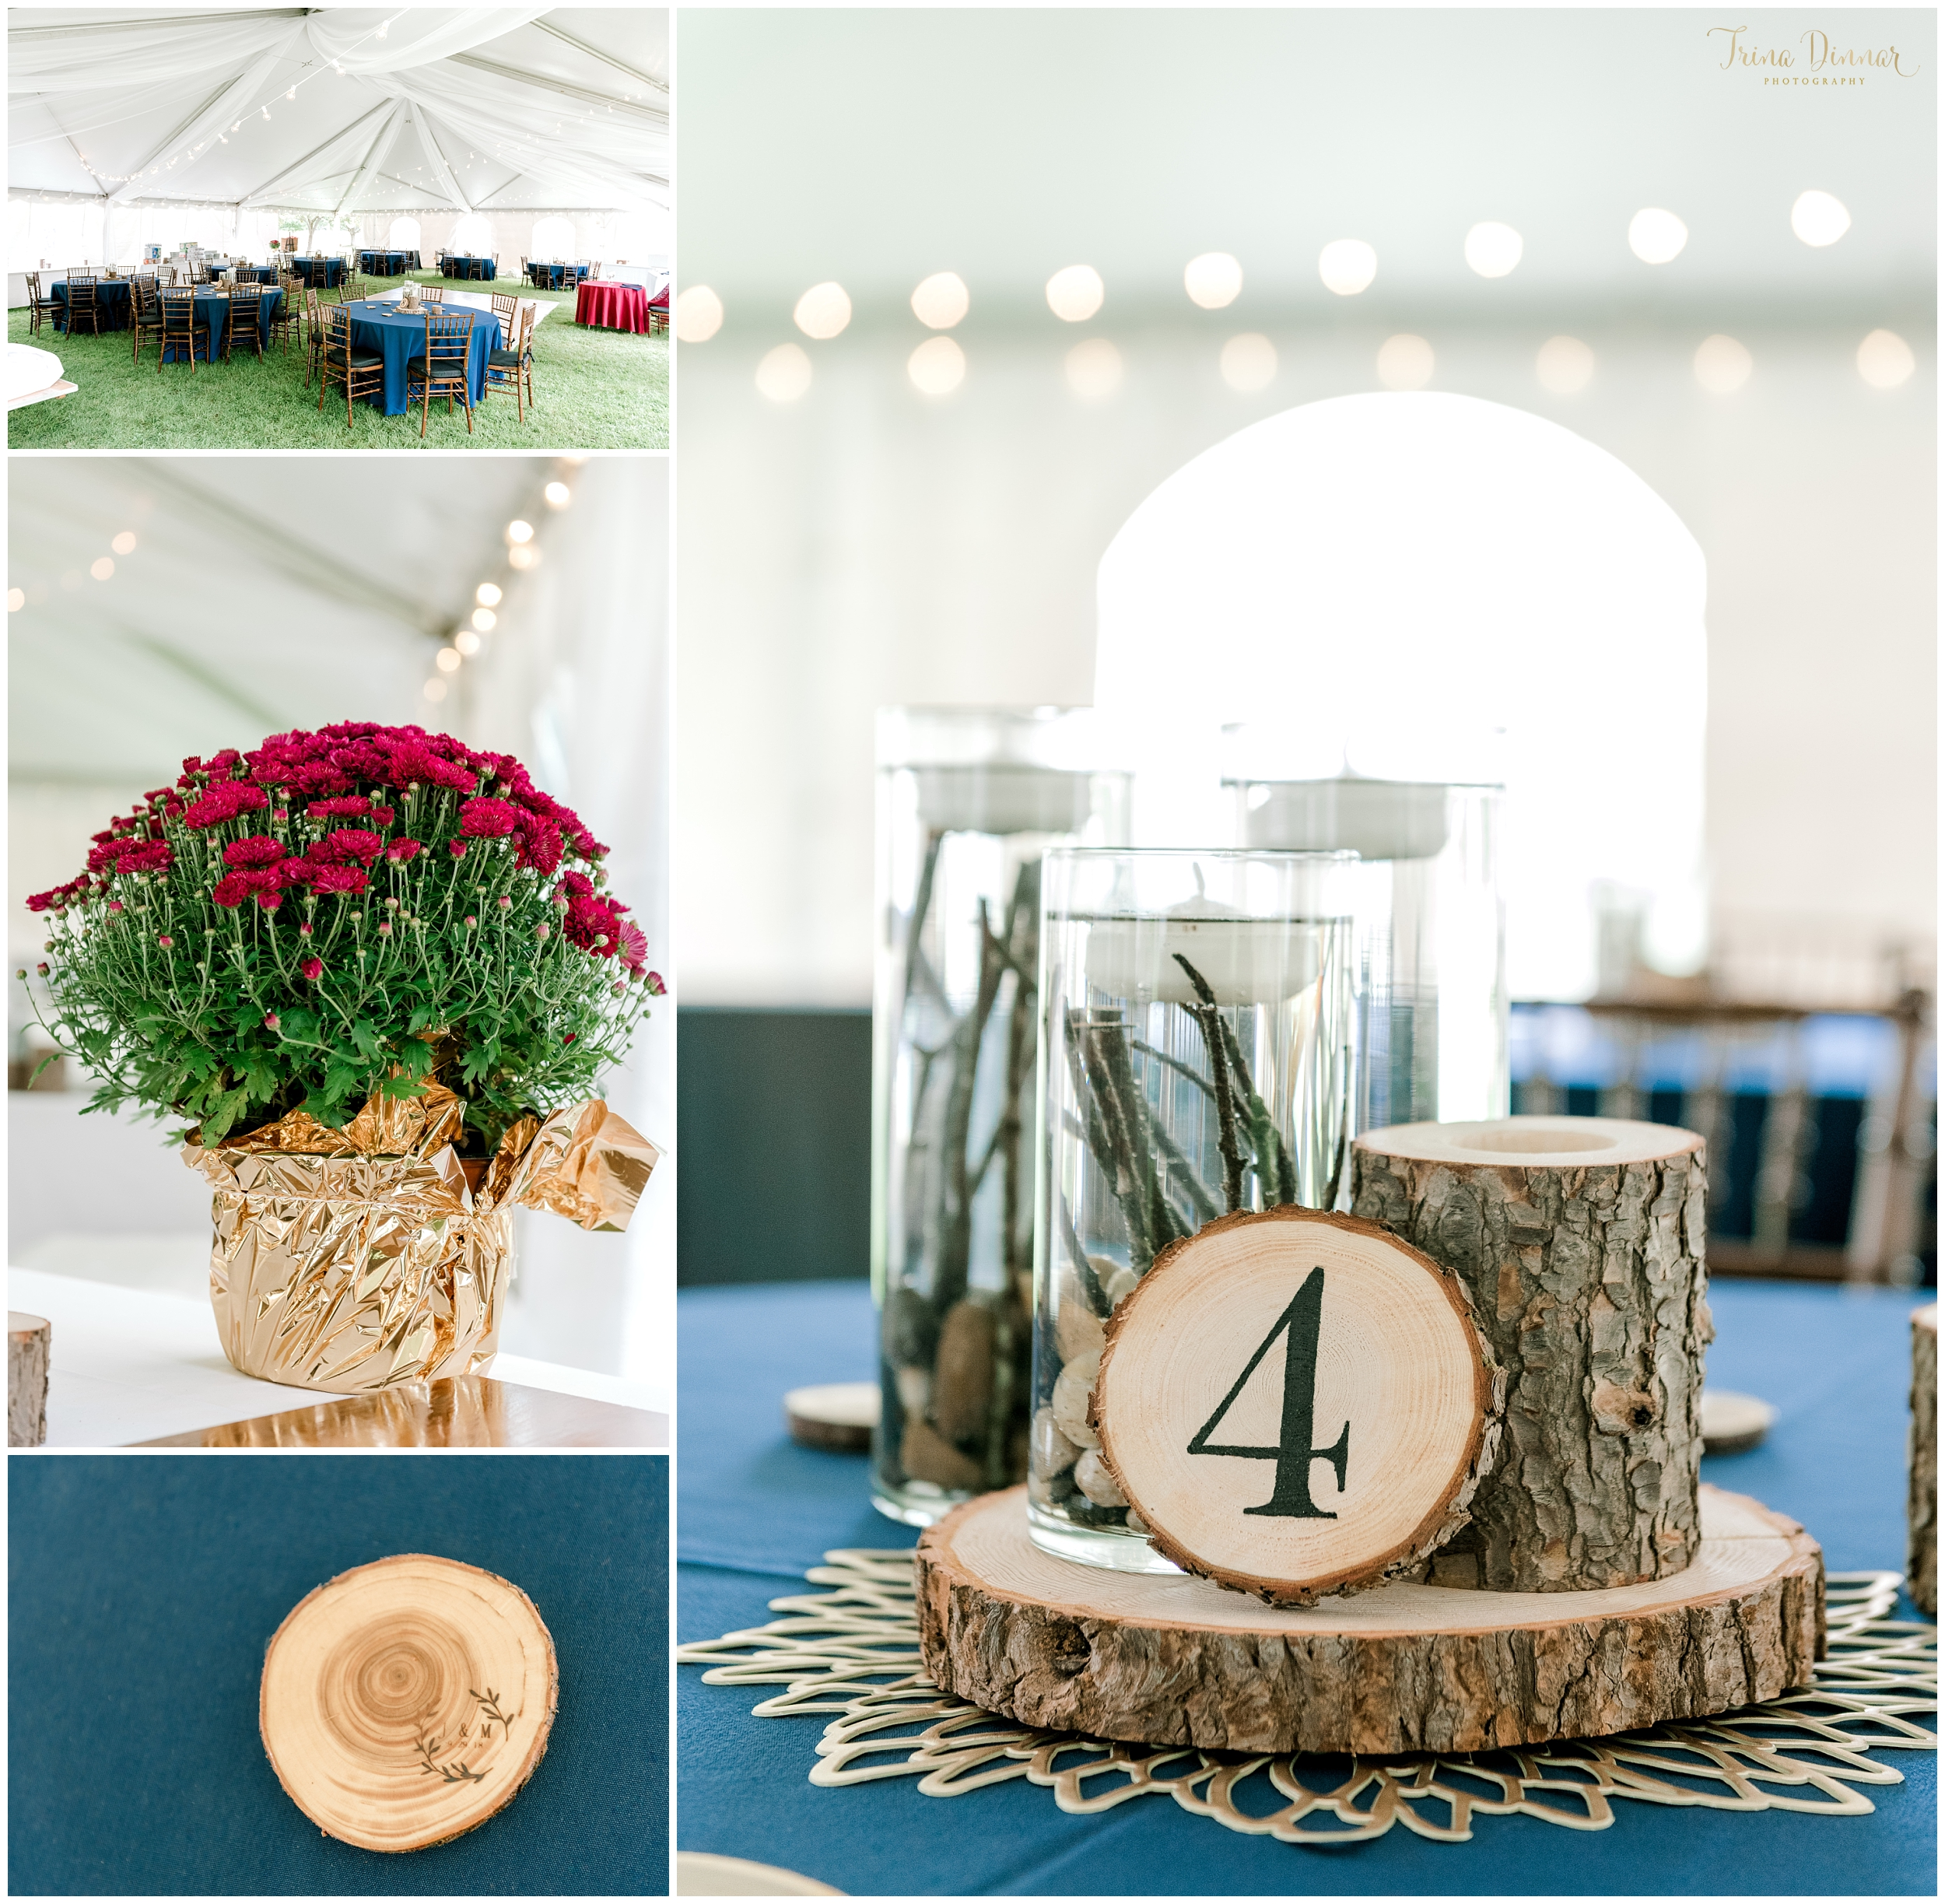 Handmade elegant rustic wedding reception centerpieces